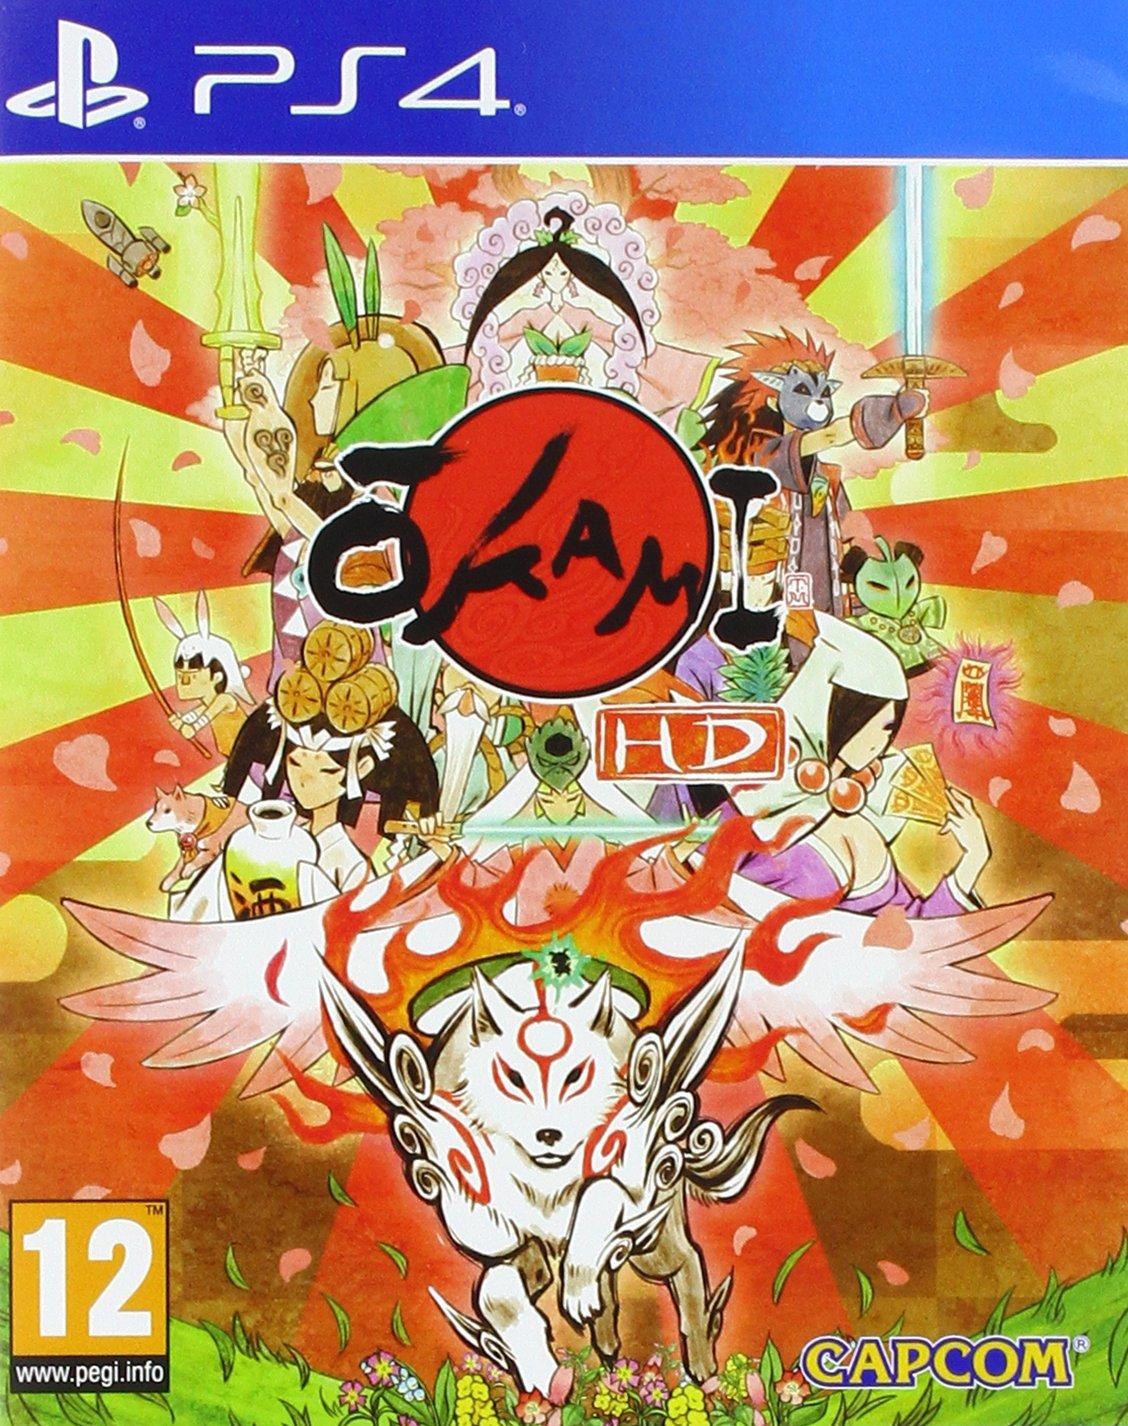 Okami HD - PS4 | Clover Studio. Programmeur